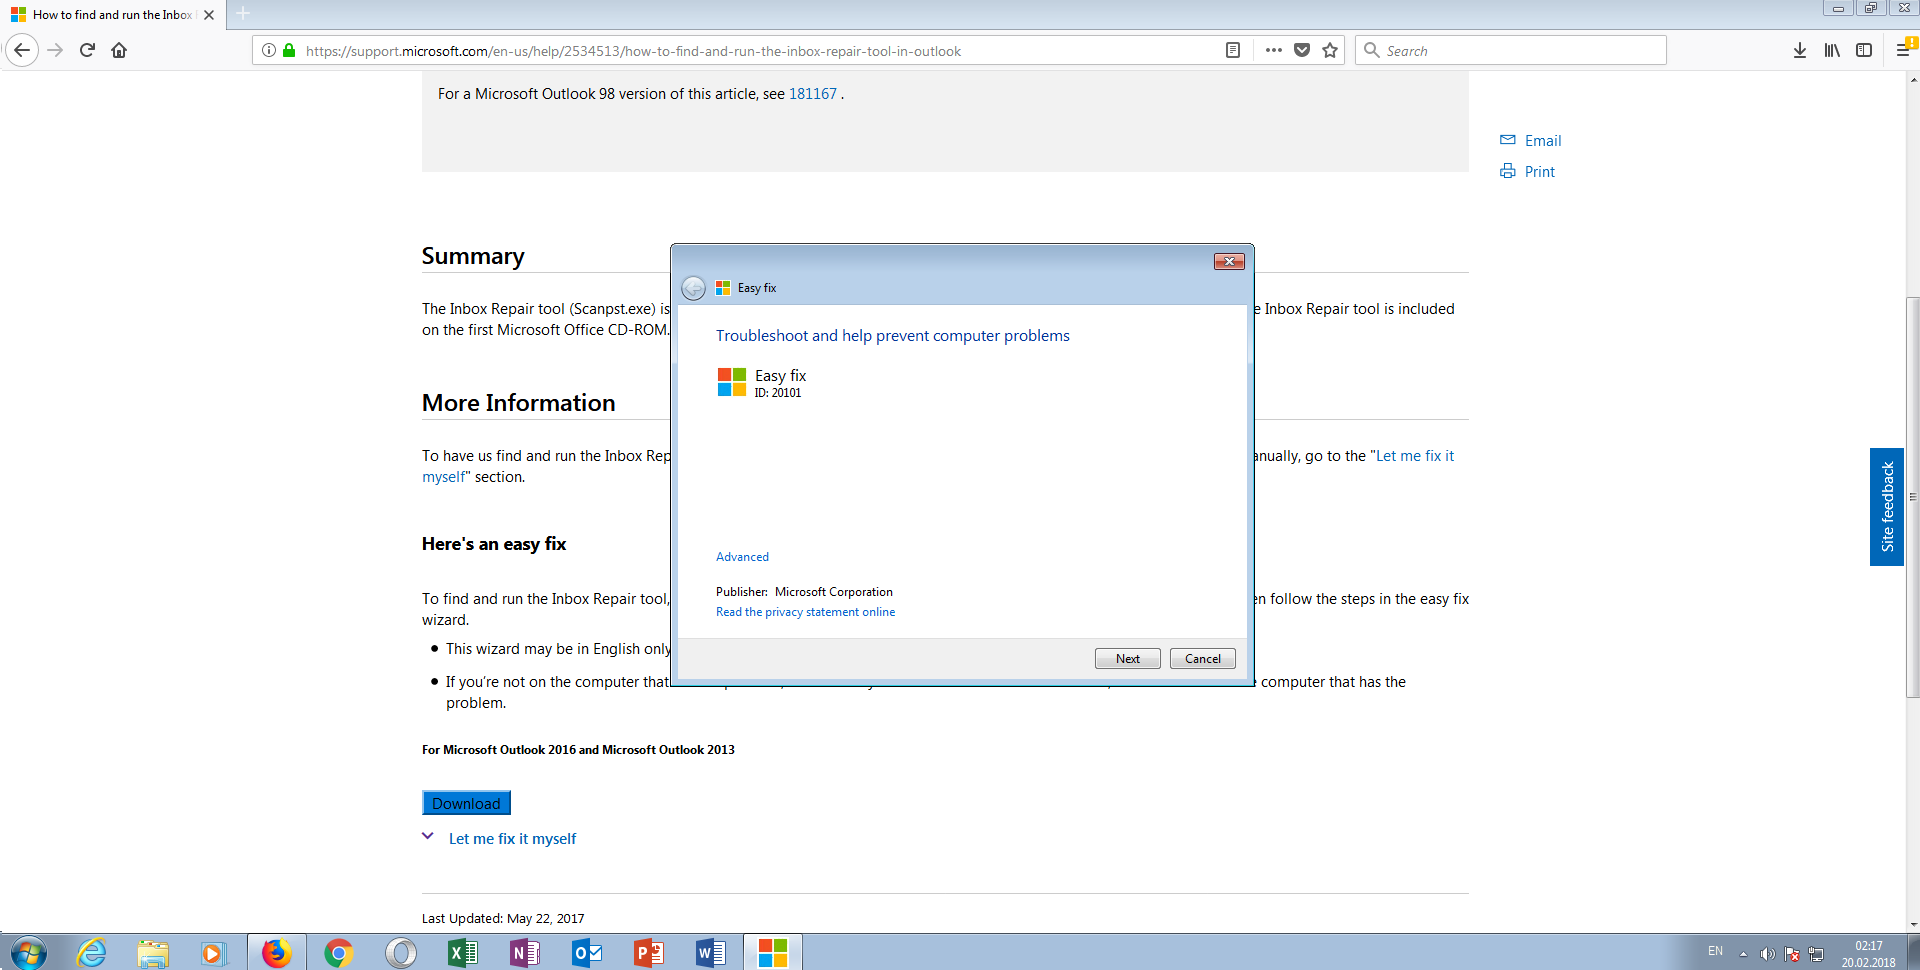 microsoft easy fix download windows 7 32 bit